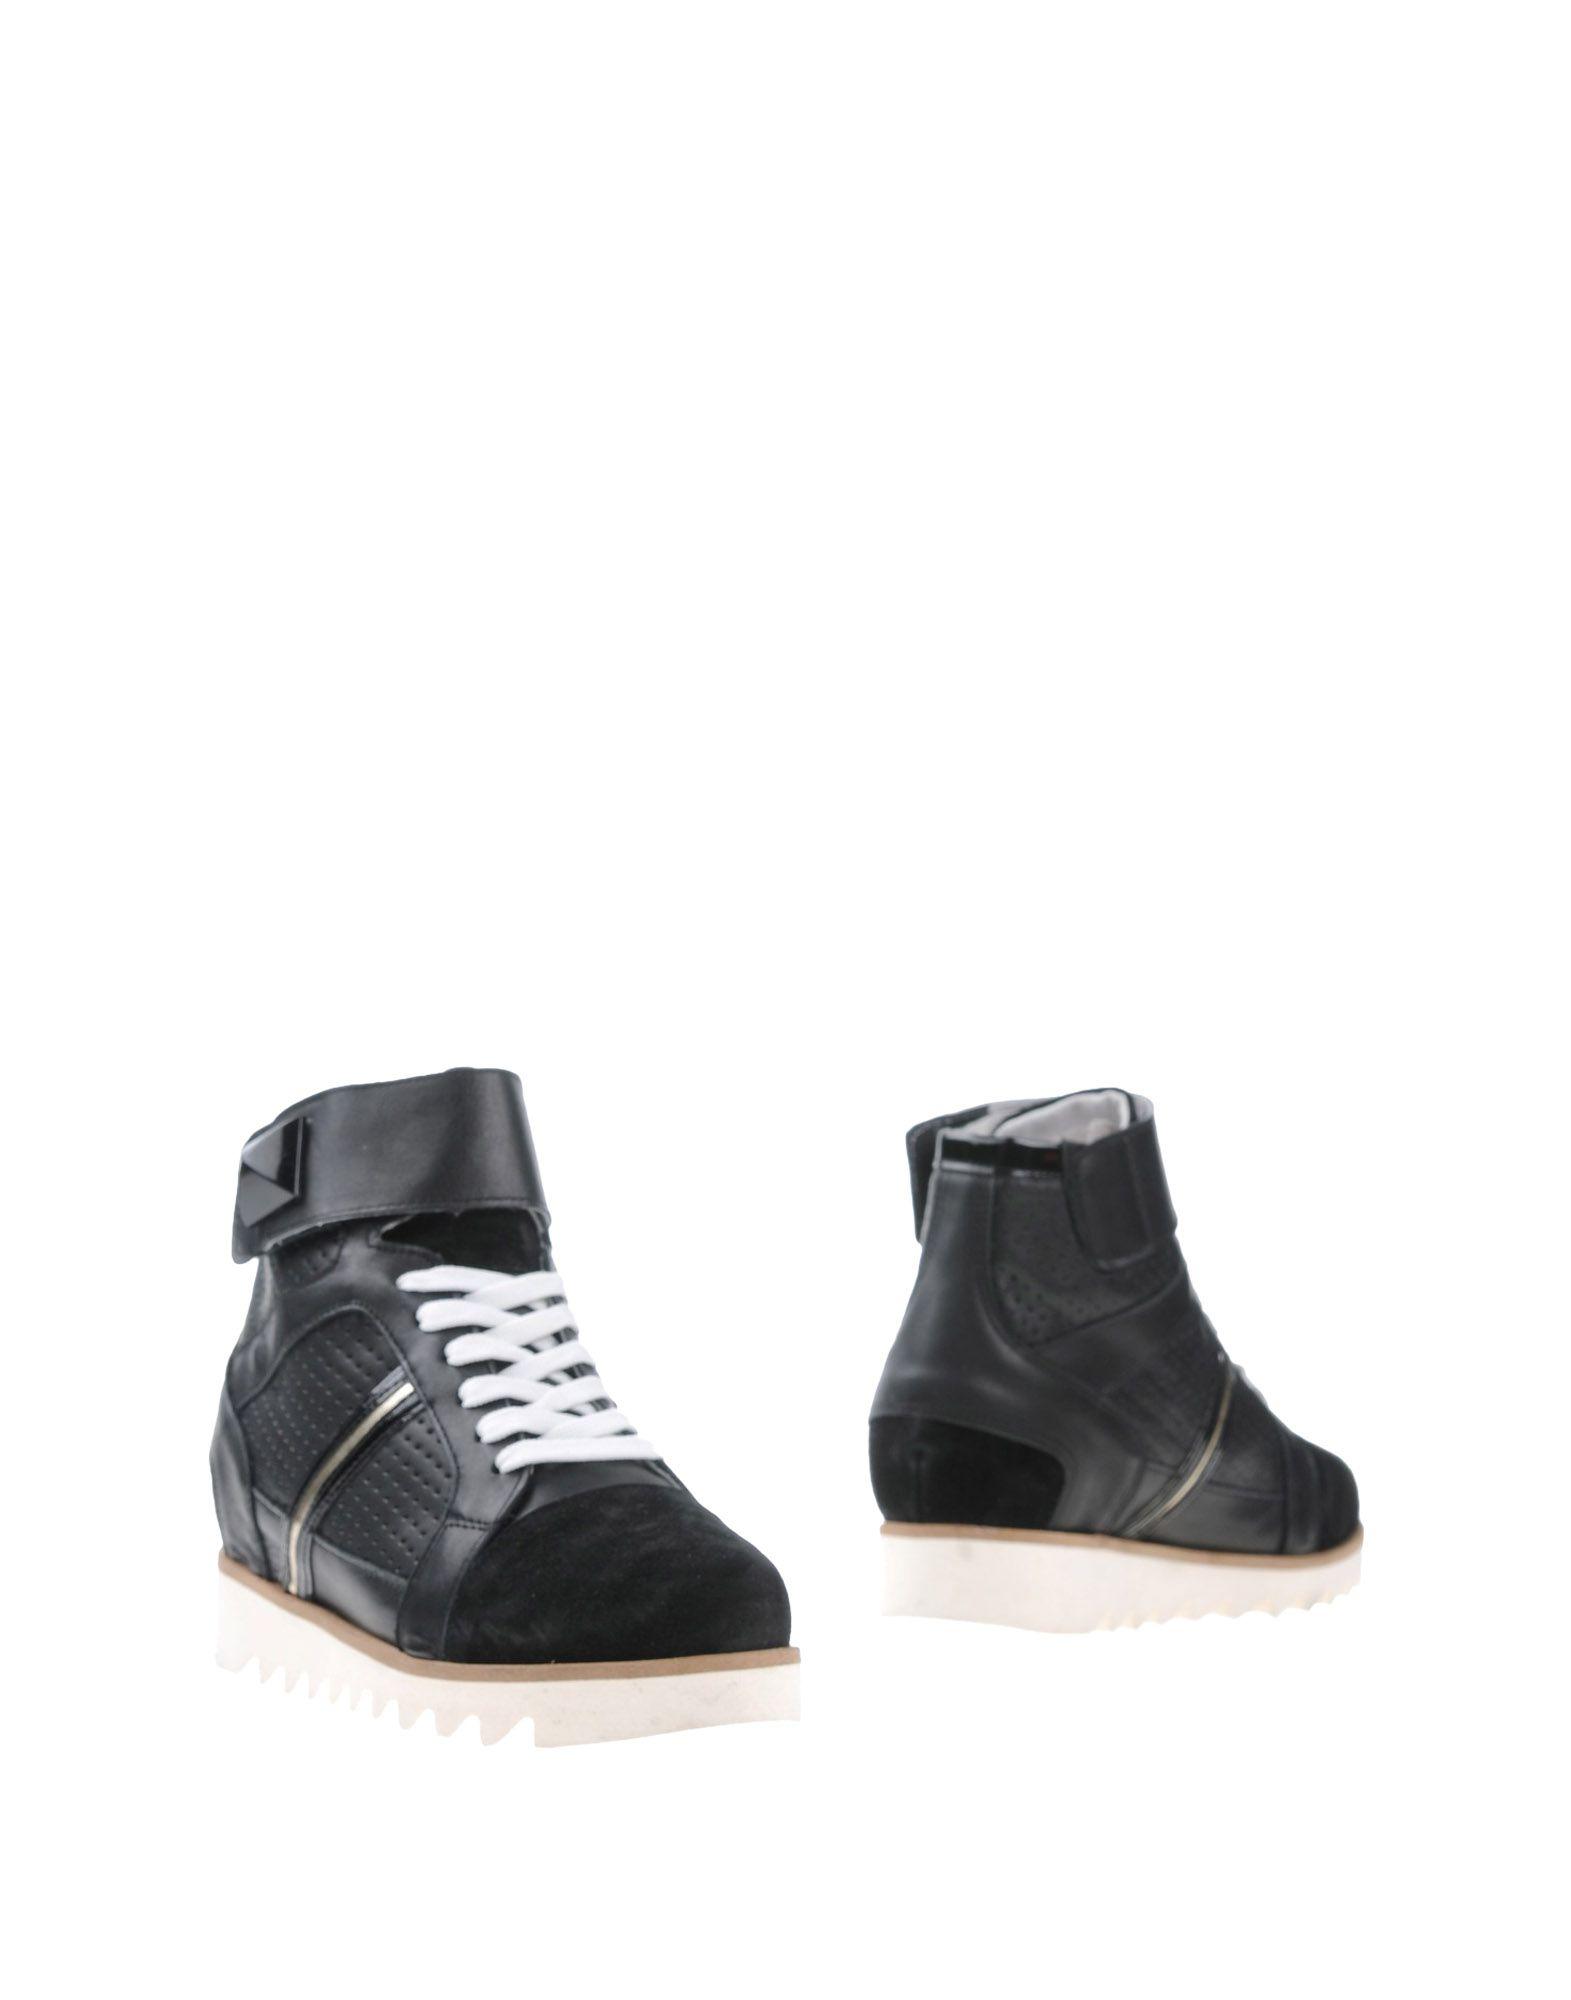 Nila & Nila Stiefelette Damen  11348349CI Gute Qualität beliebte Schuhe